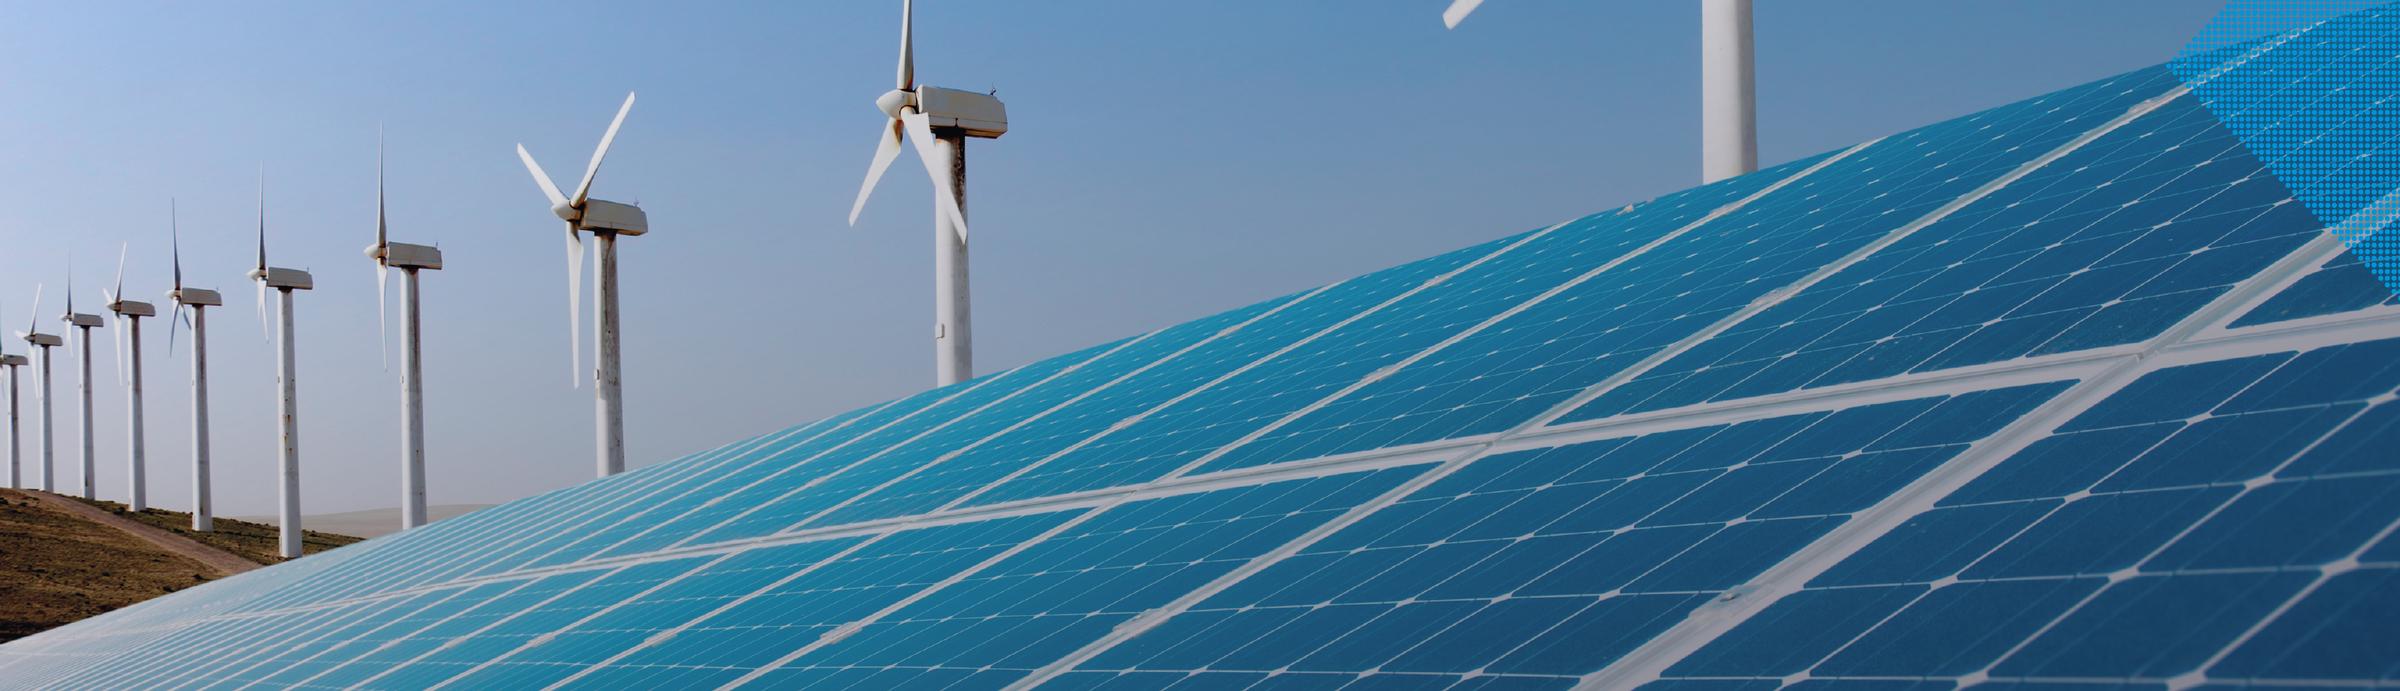 Home - Energie rinnovabili